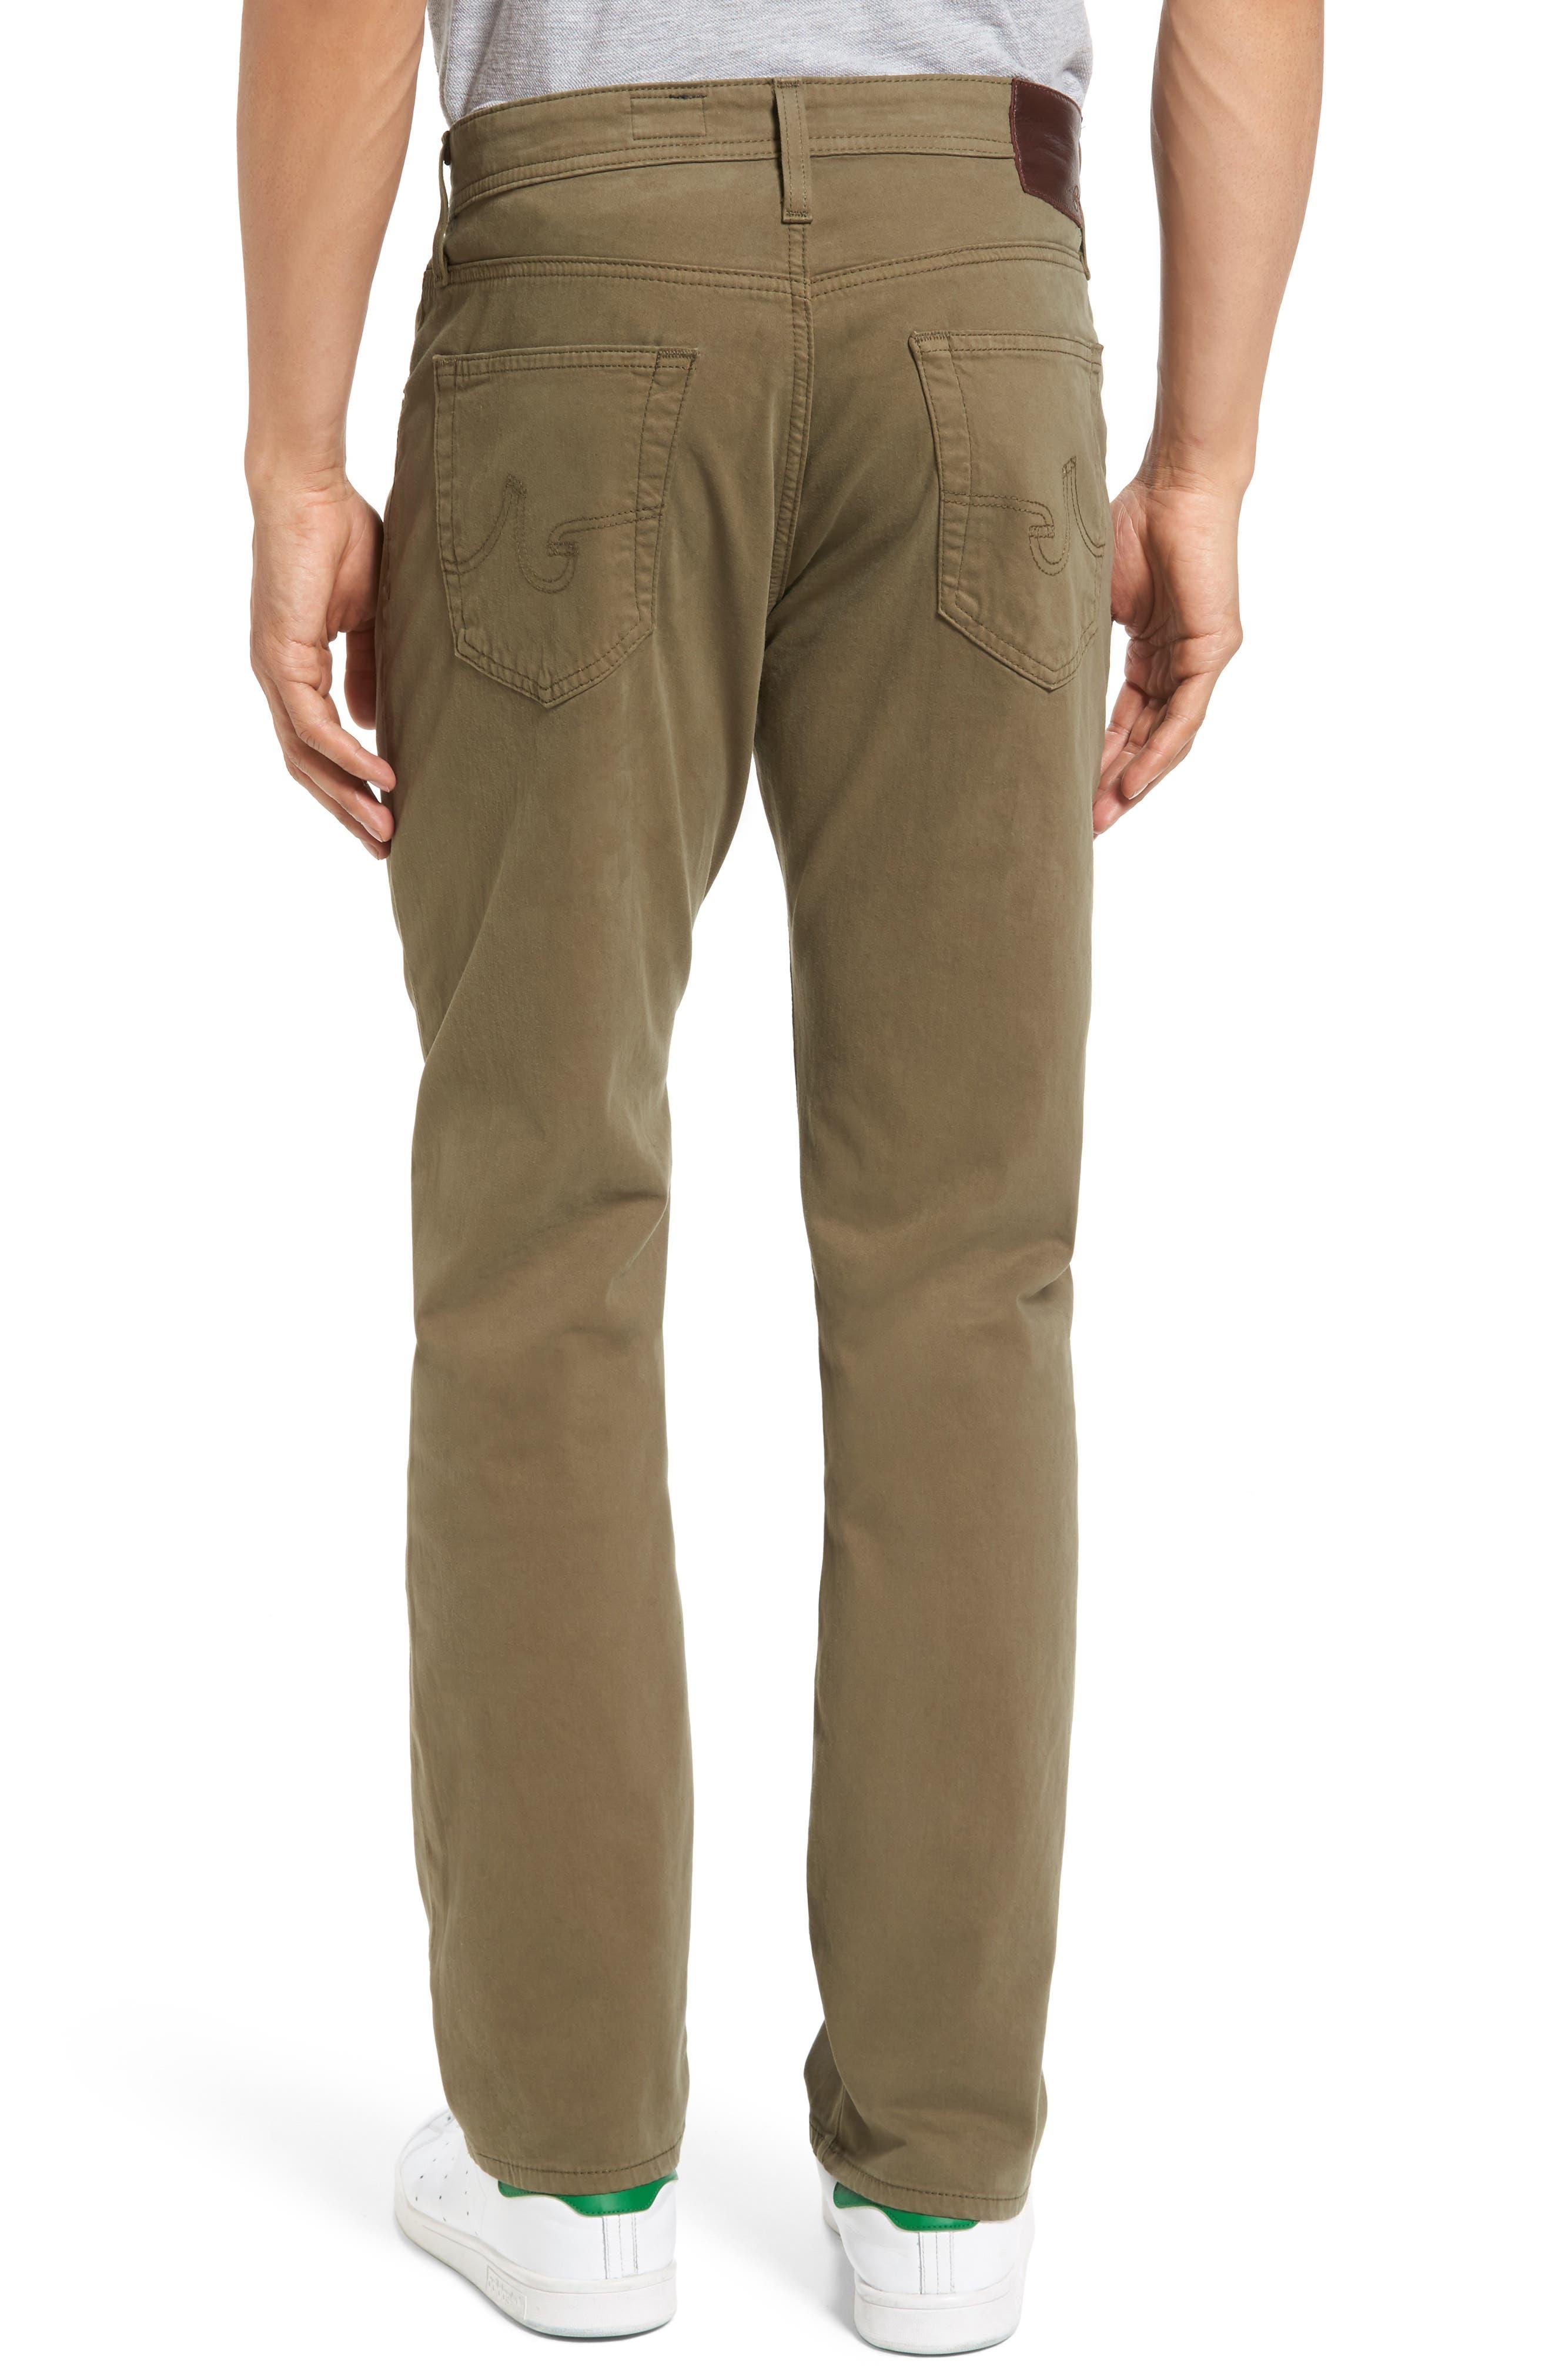 Graduate SUD Slim Straight Leg Pants,                             Alternate thumbnail 2, color,                             Caper Leaf